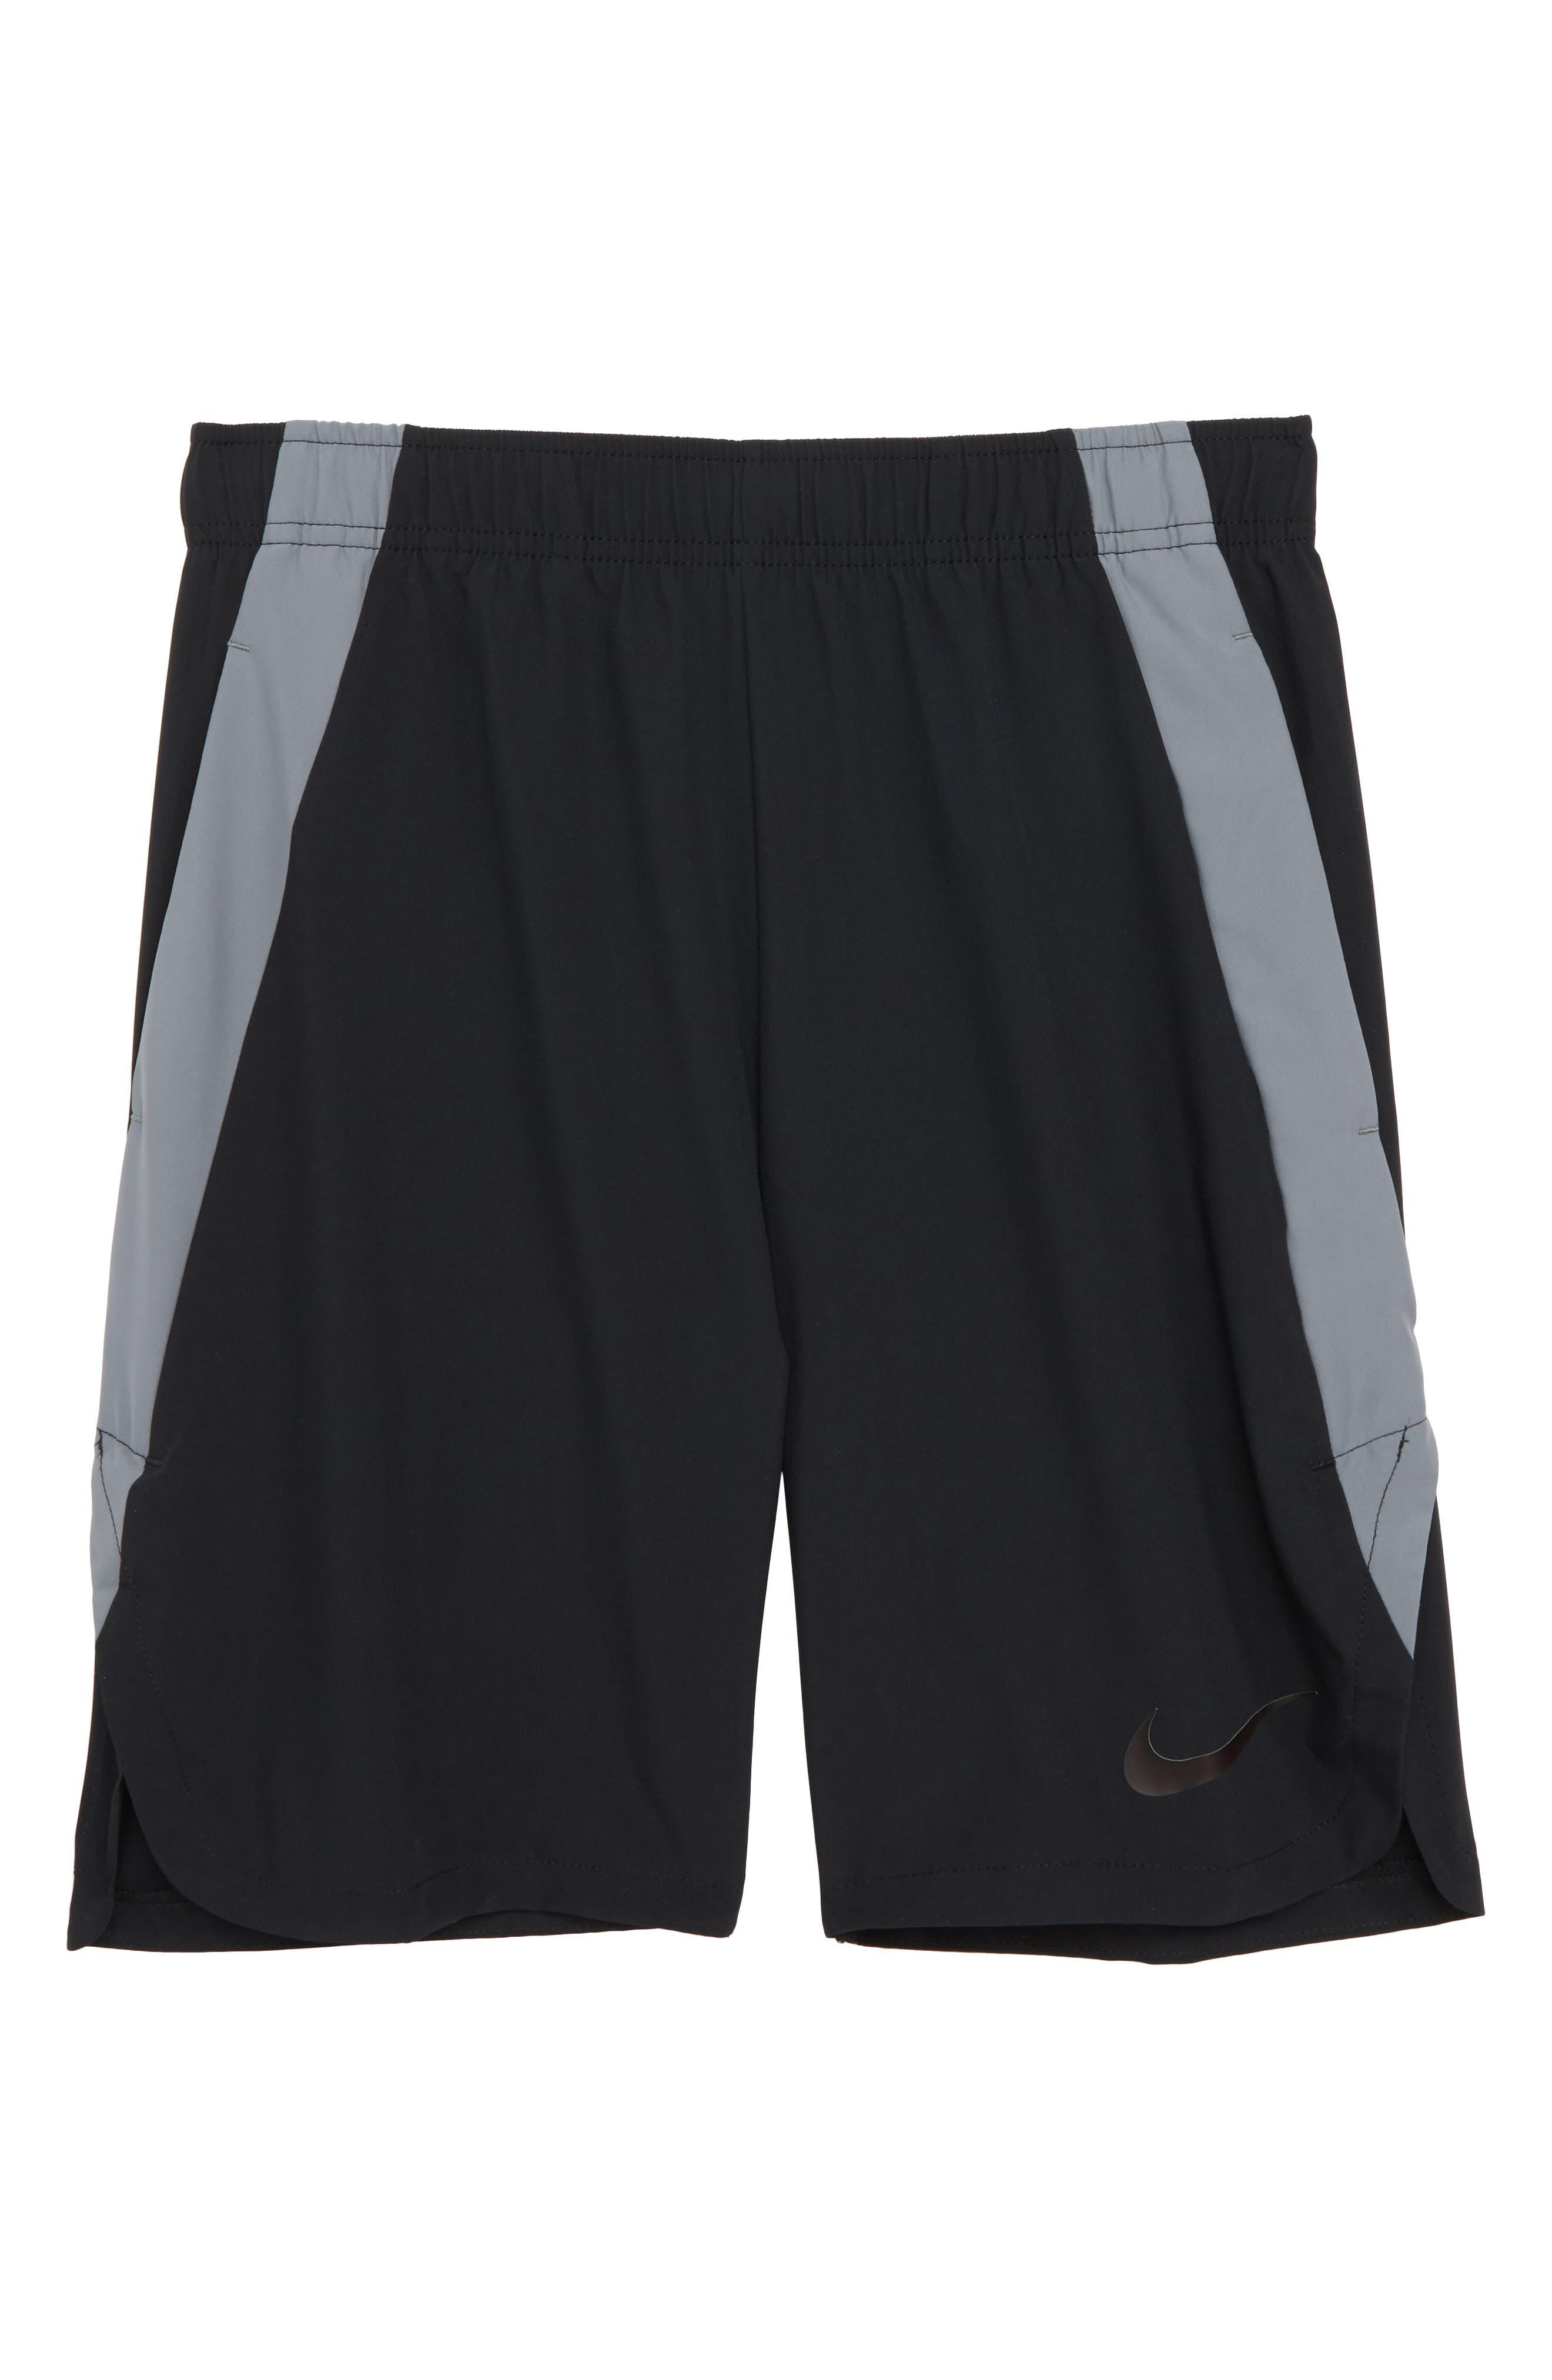 Dry Training Shorts,                             Main thumbnail 1, color,                             BLACK/ COOL GREY